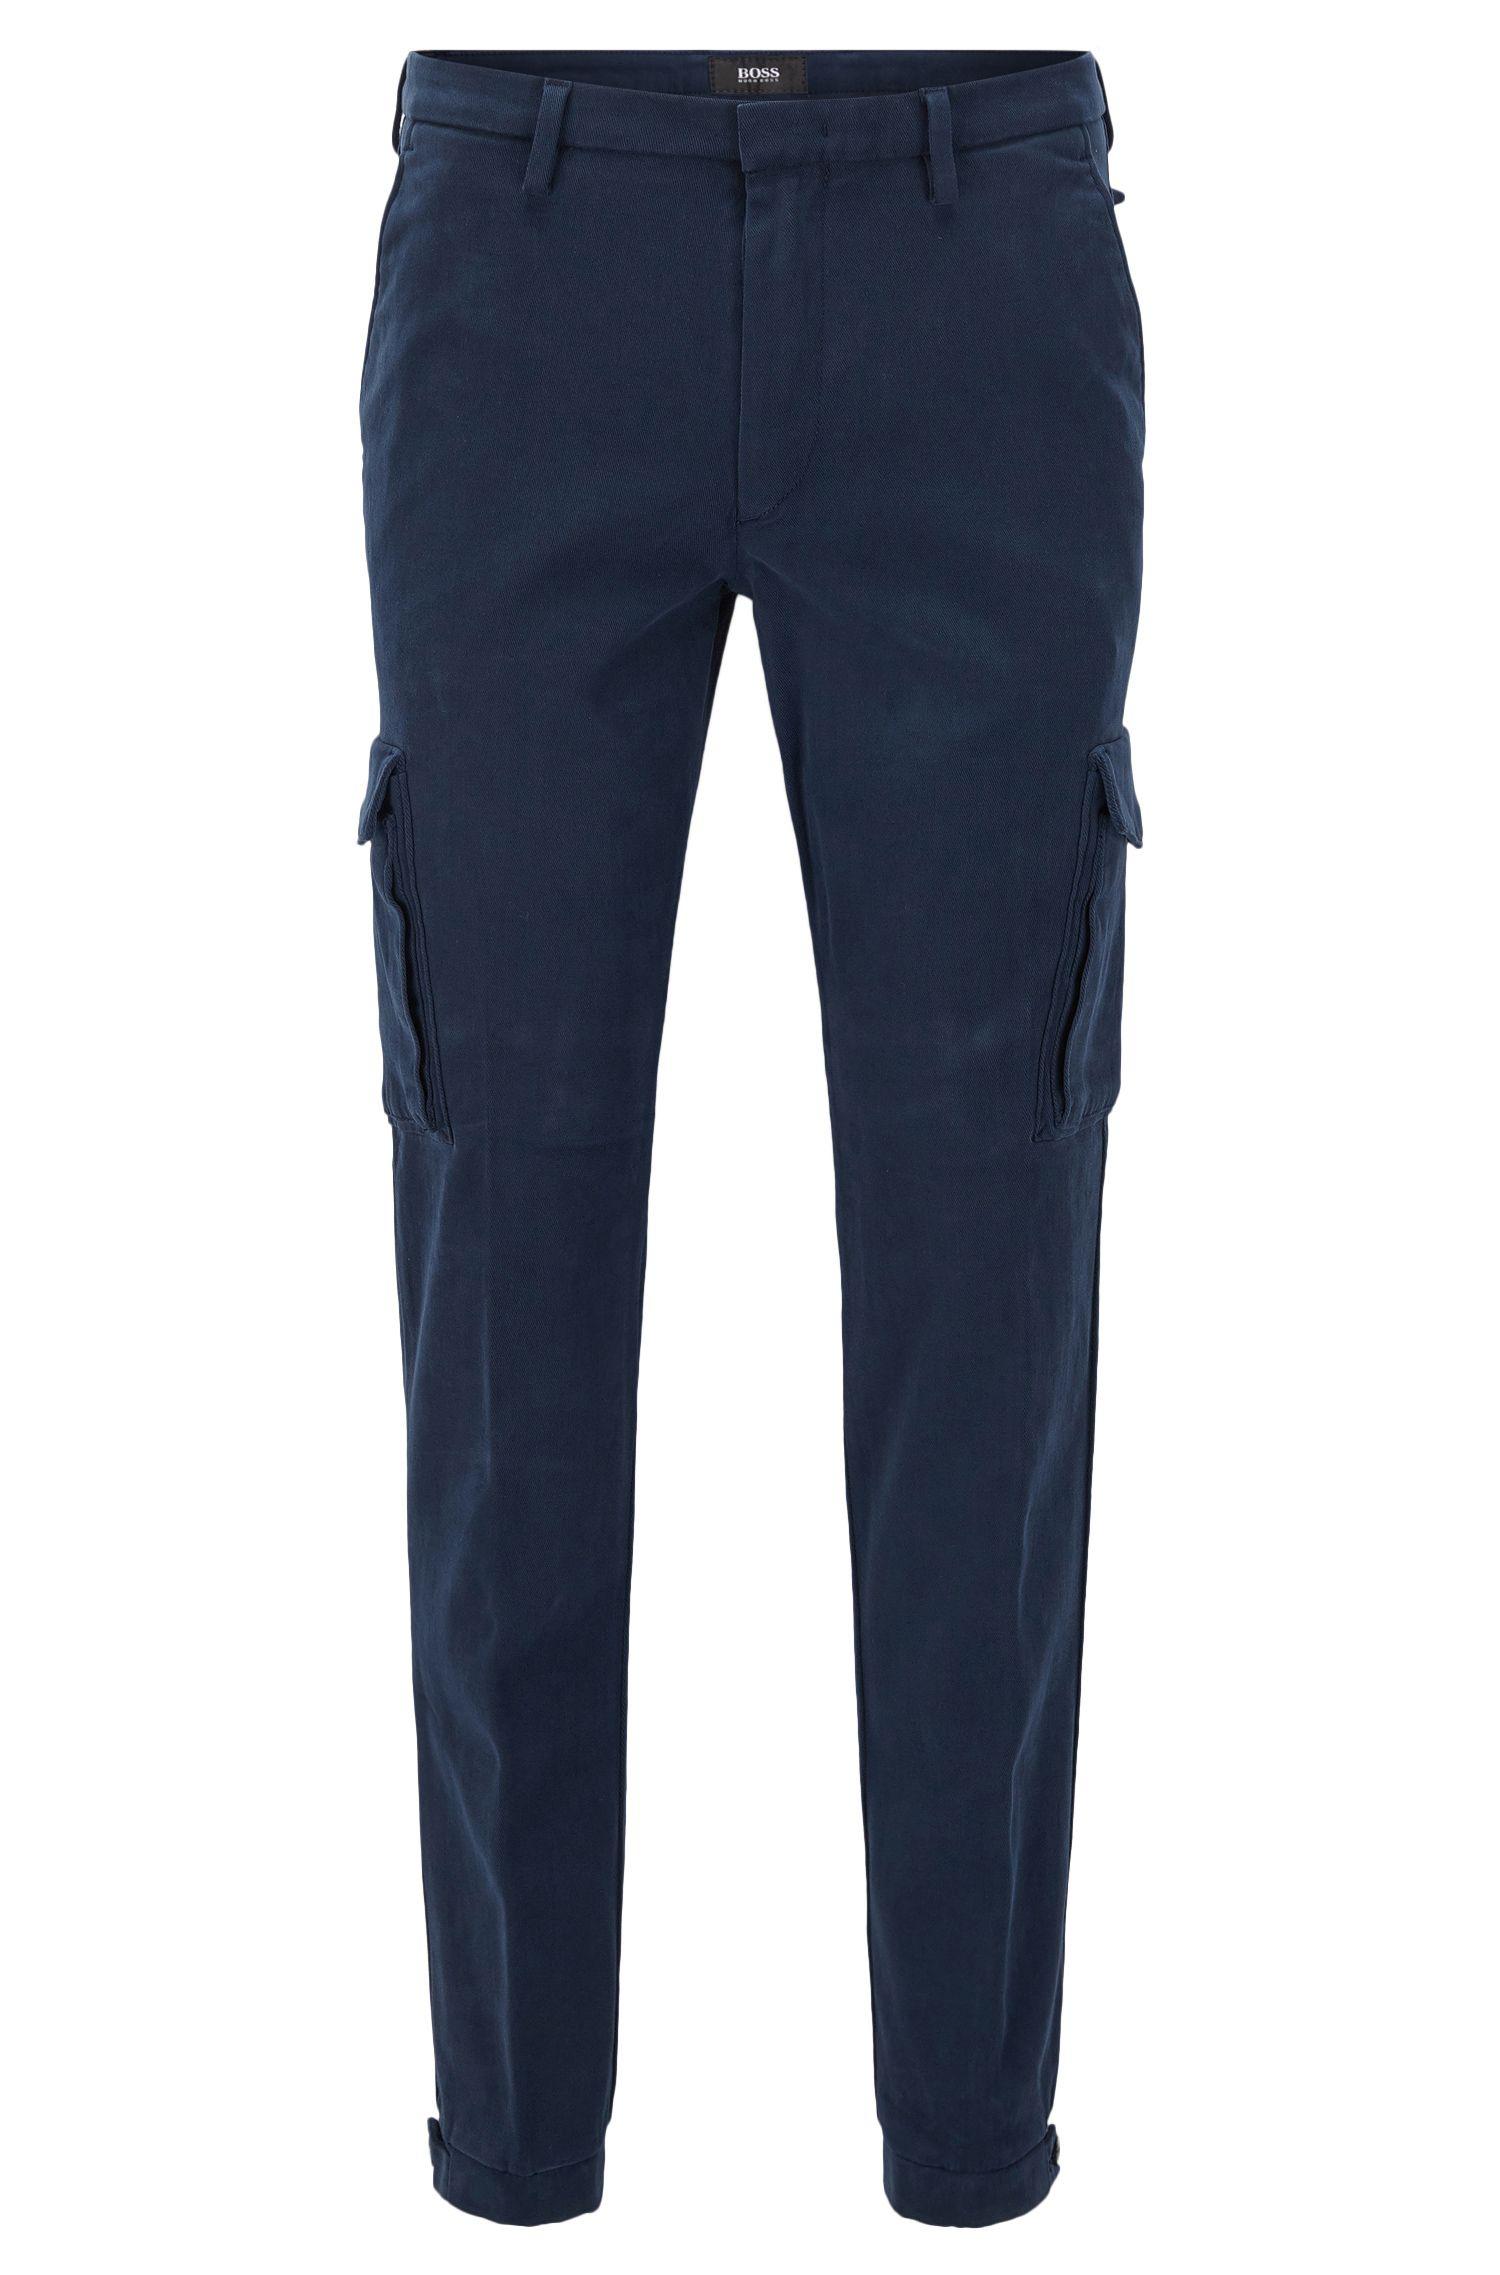 Slim-fit cargo trousers in Italian stretch cotton